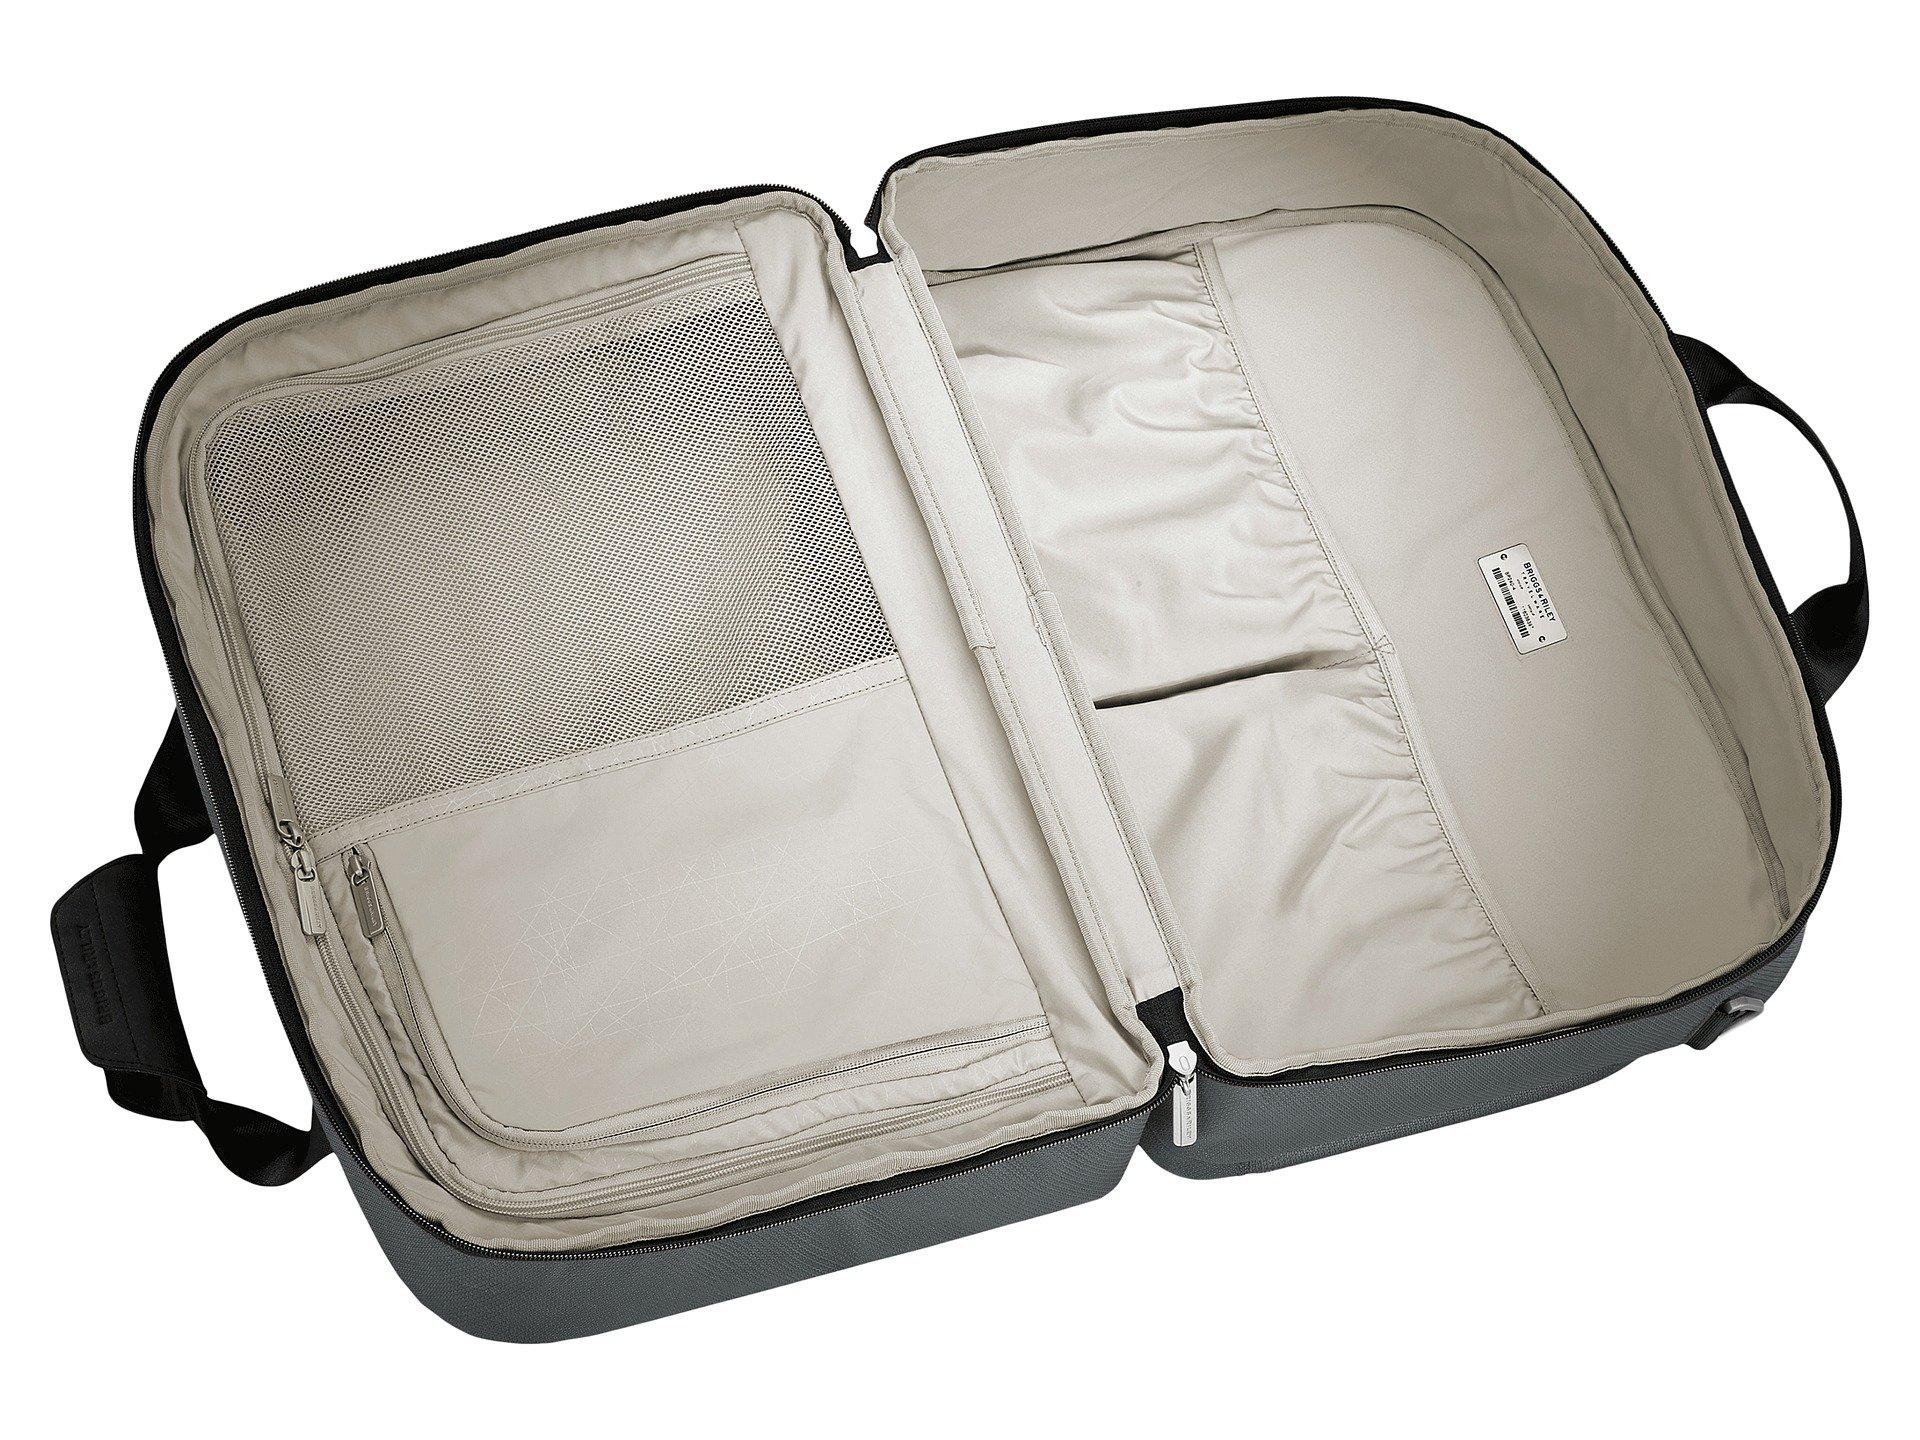 Clamshell Riley Bag Grey Transcend Cabin Briggs Vx amp; Slate qRZIwOvz